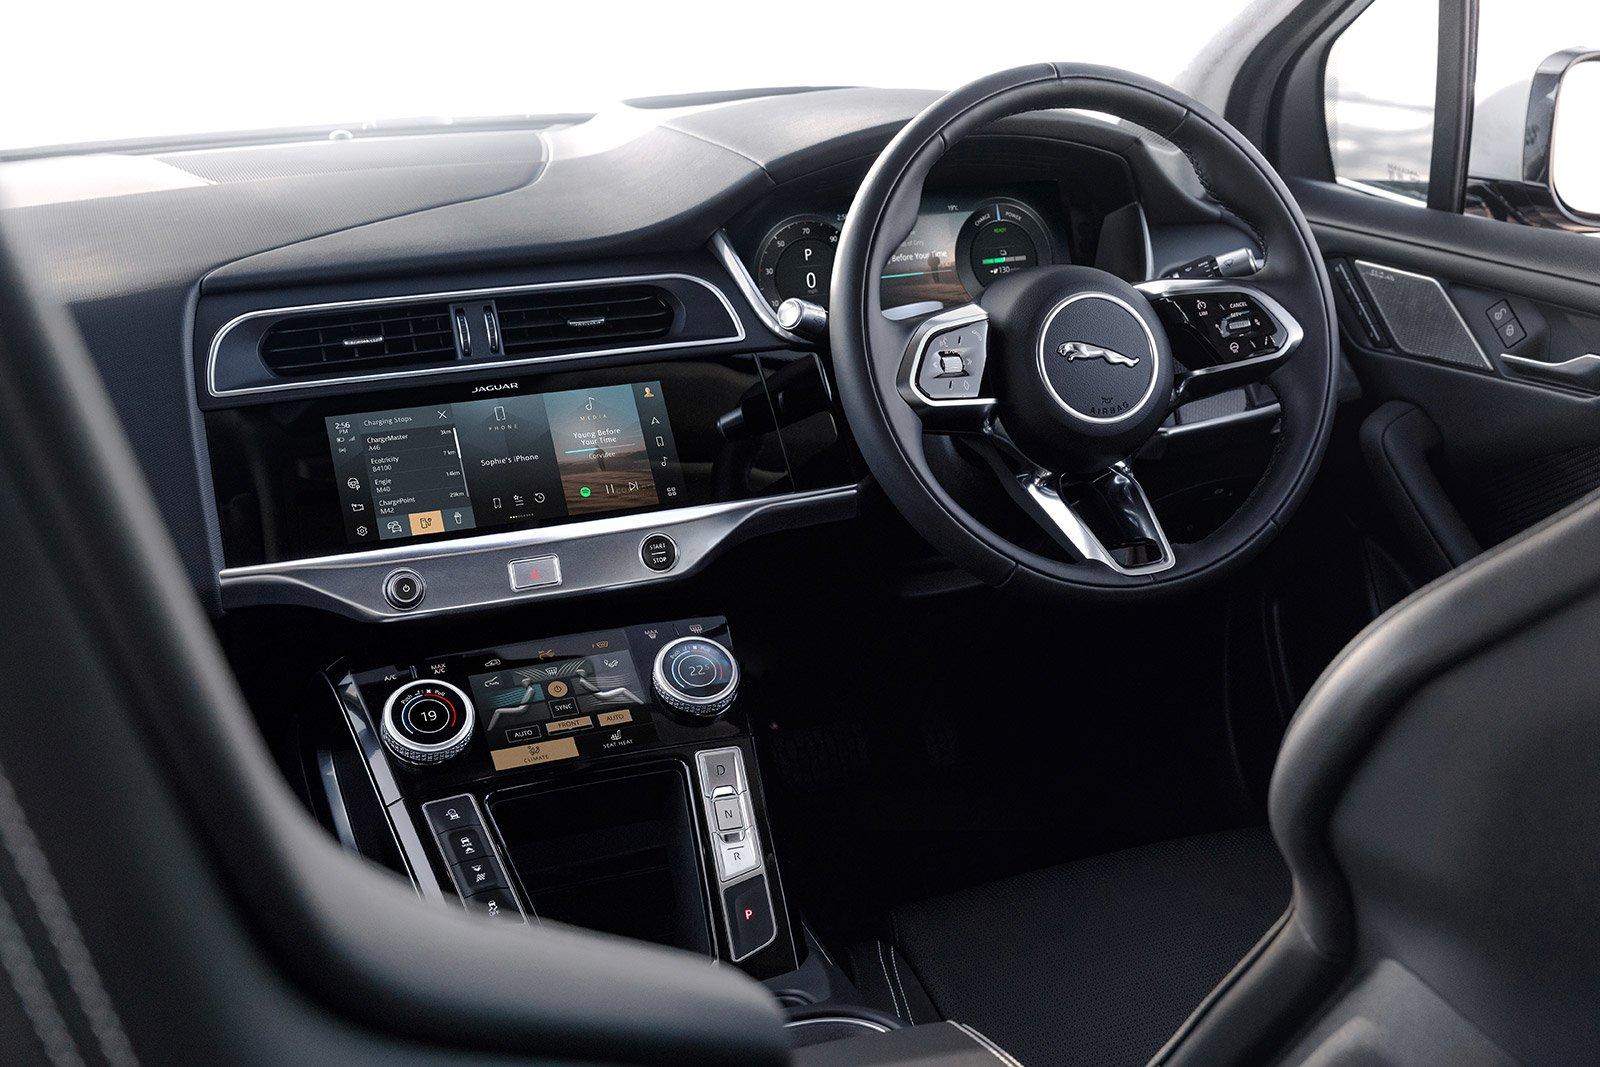 LUXURY SUV: Jaguar I-Pace EV400 S dashboard